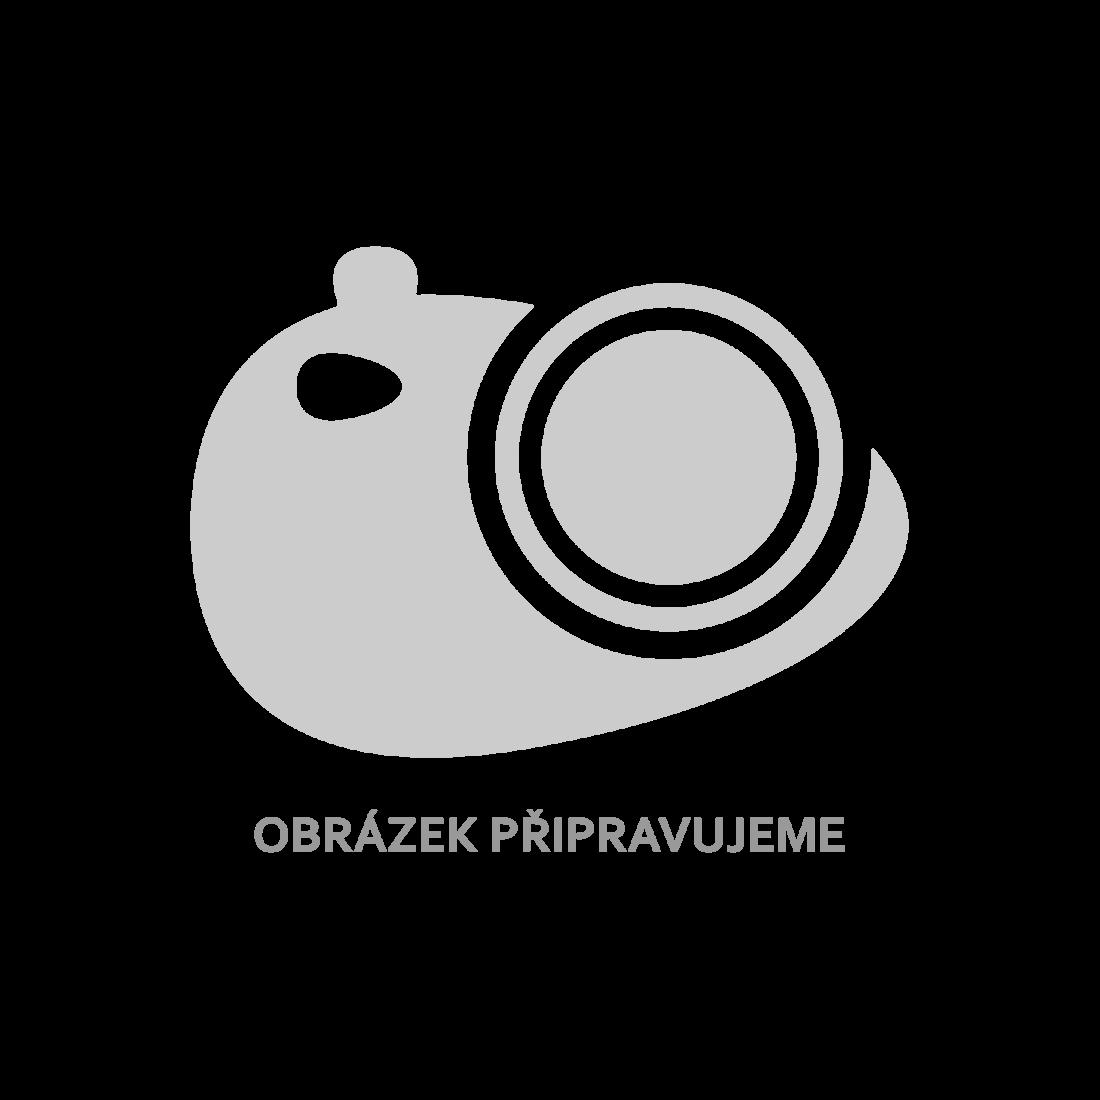 4dílná zahradní sedací souprava s poduškami šedá polyratanová